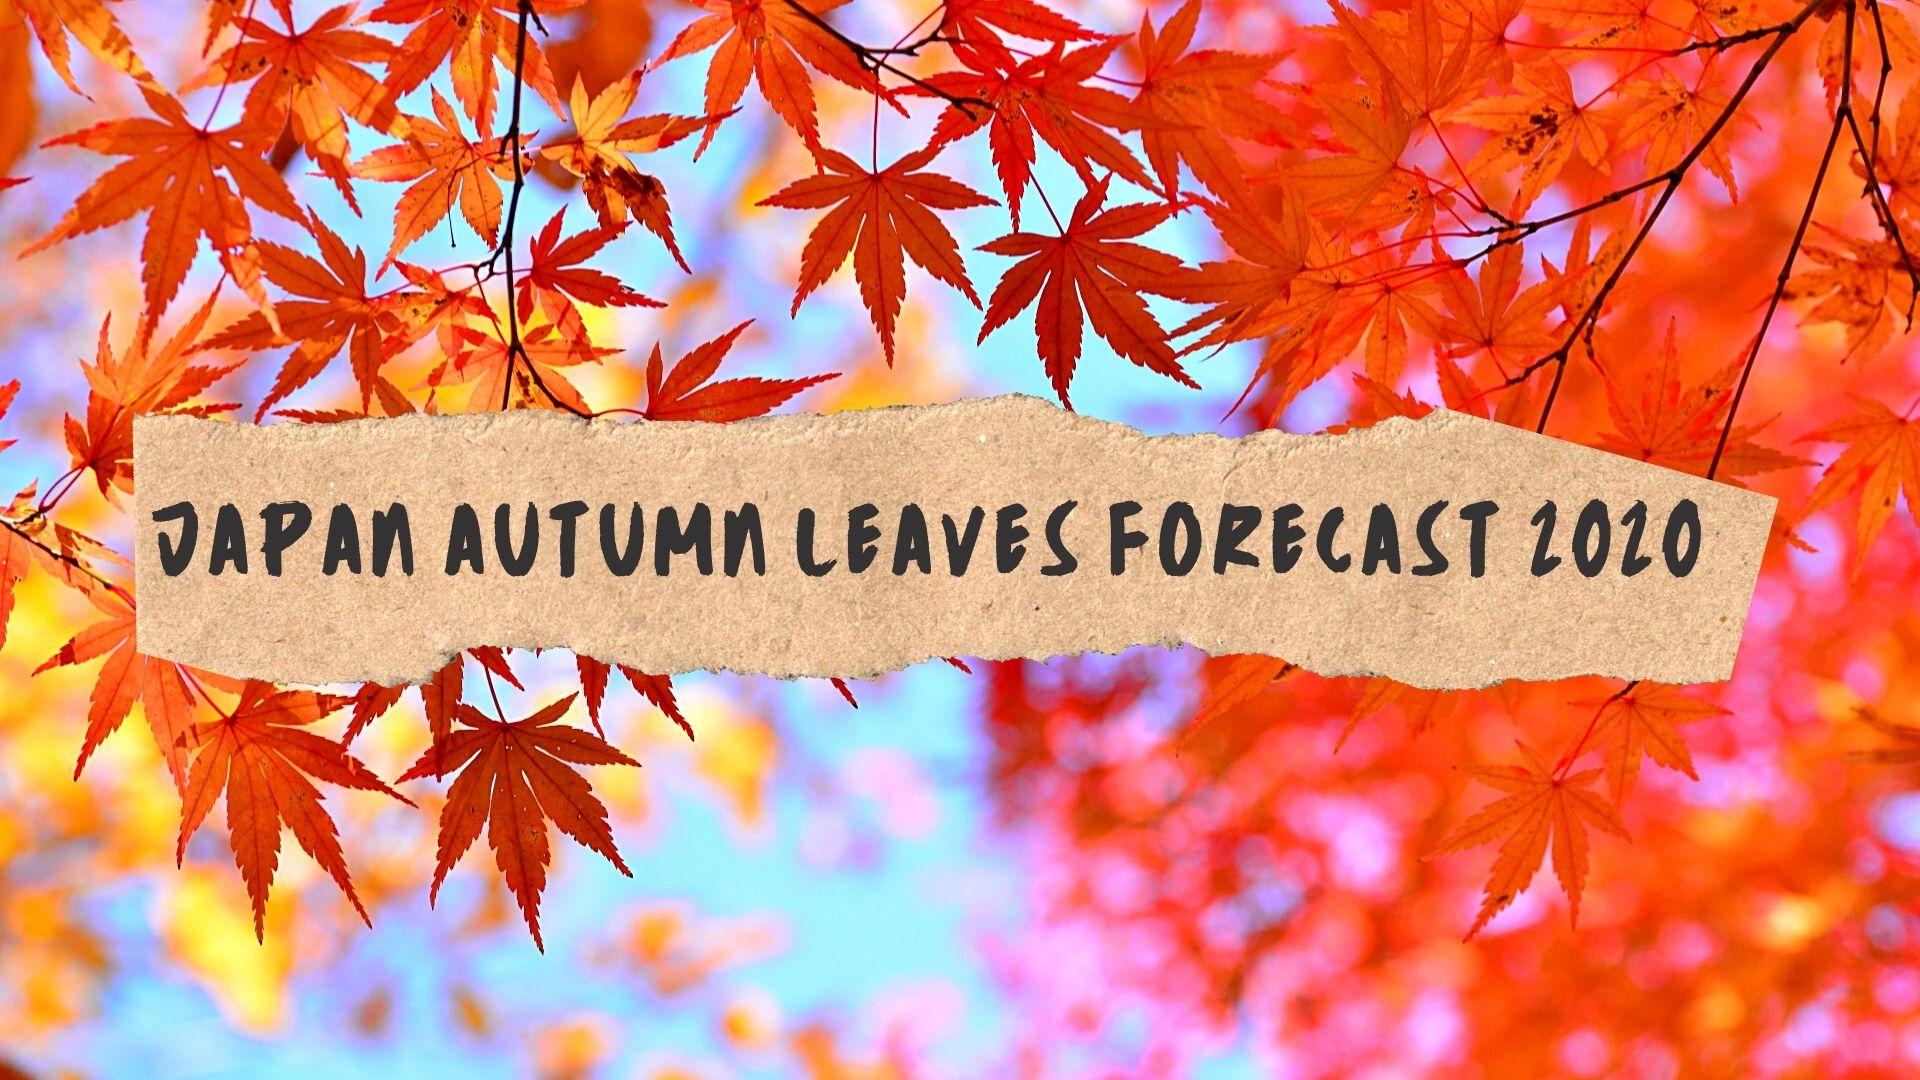 Japan Autumn Leaves Forecast 2020